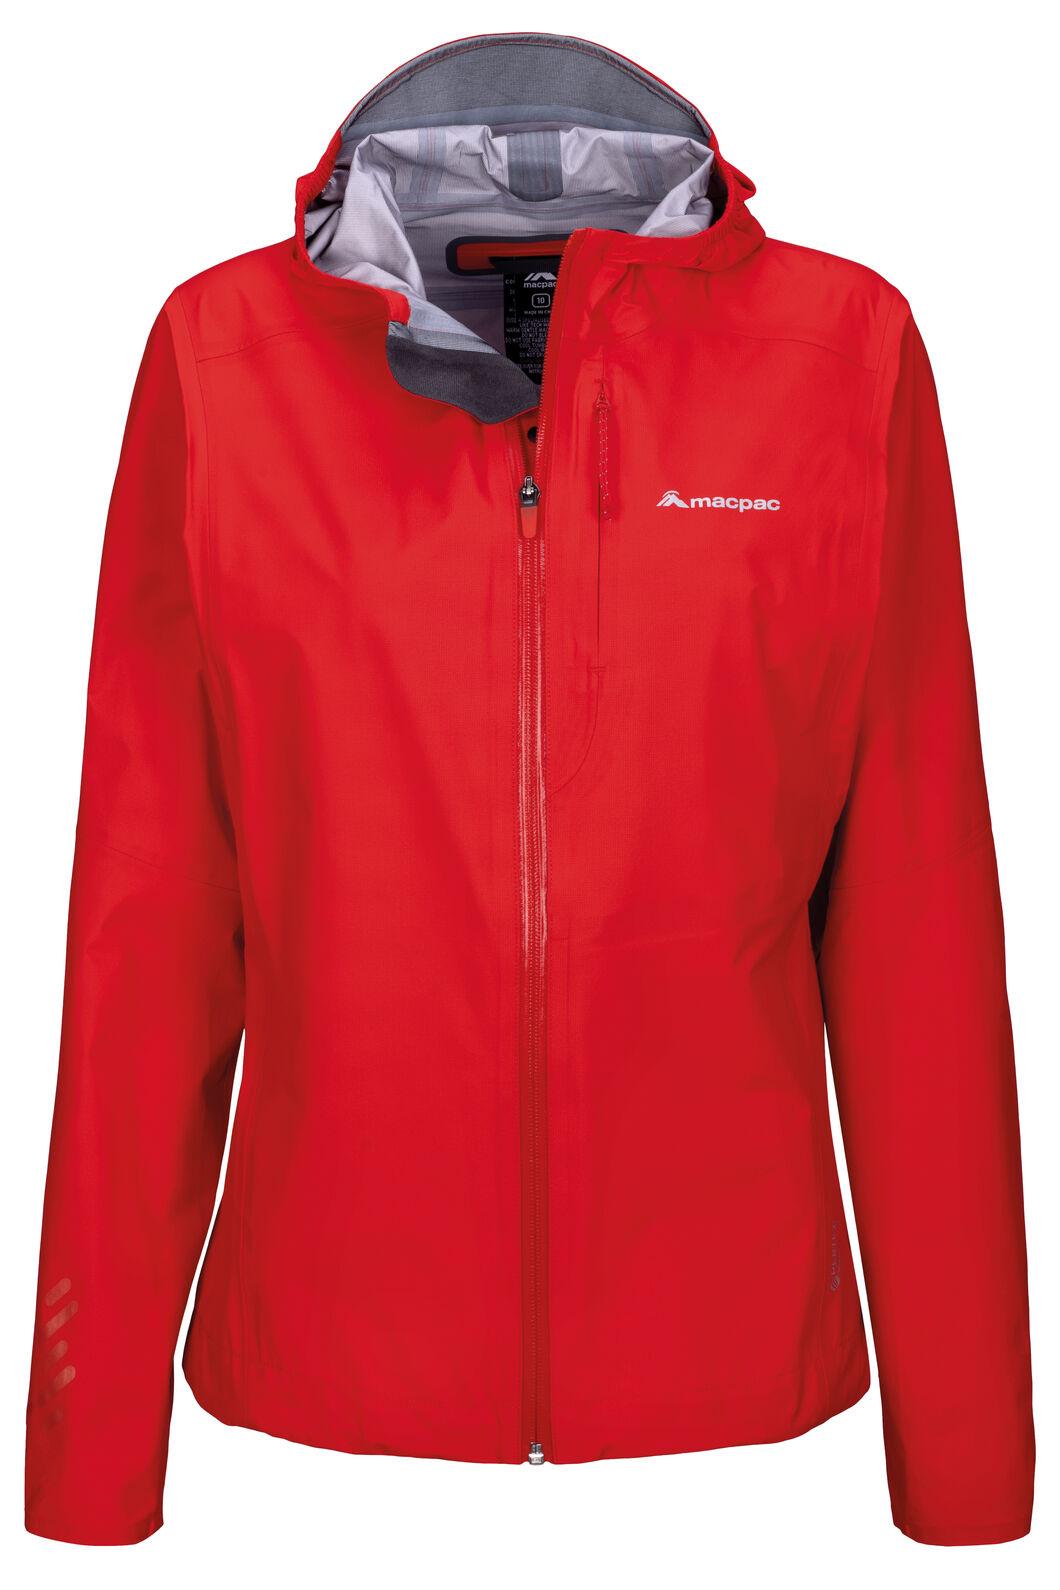 Macpac Women's Tempo Pertex® Rain Jacket, Fiery Red, hi-res